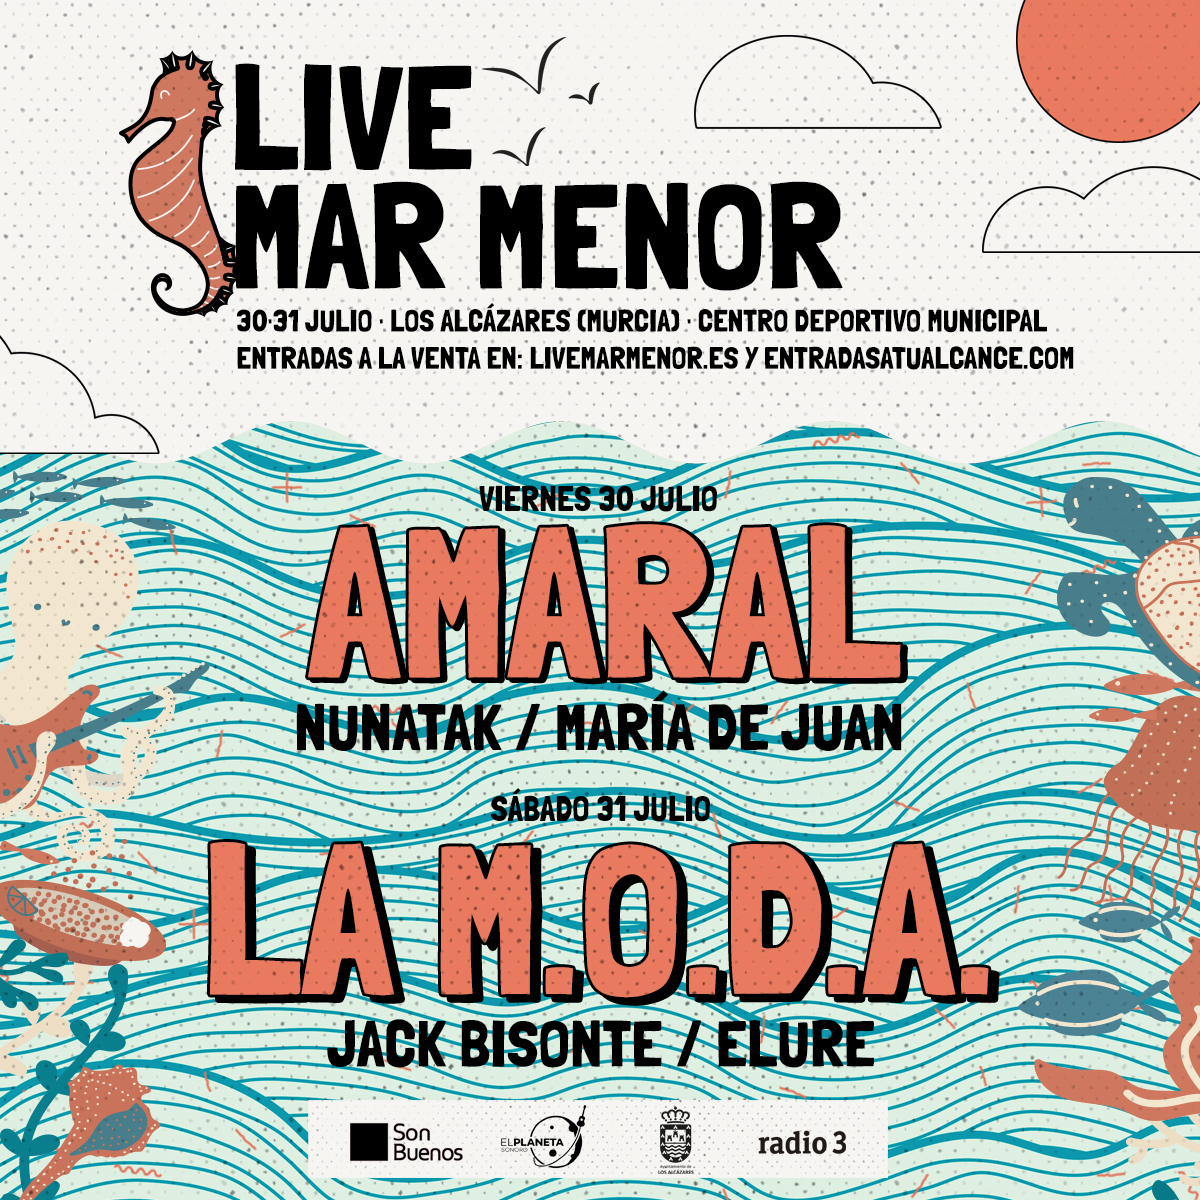 CARTEL_LIVE_MAR_MENOR_MAYO_2021_RRSS (5)